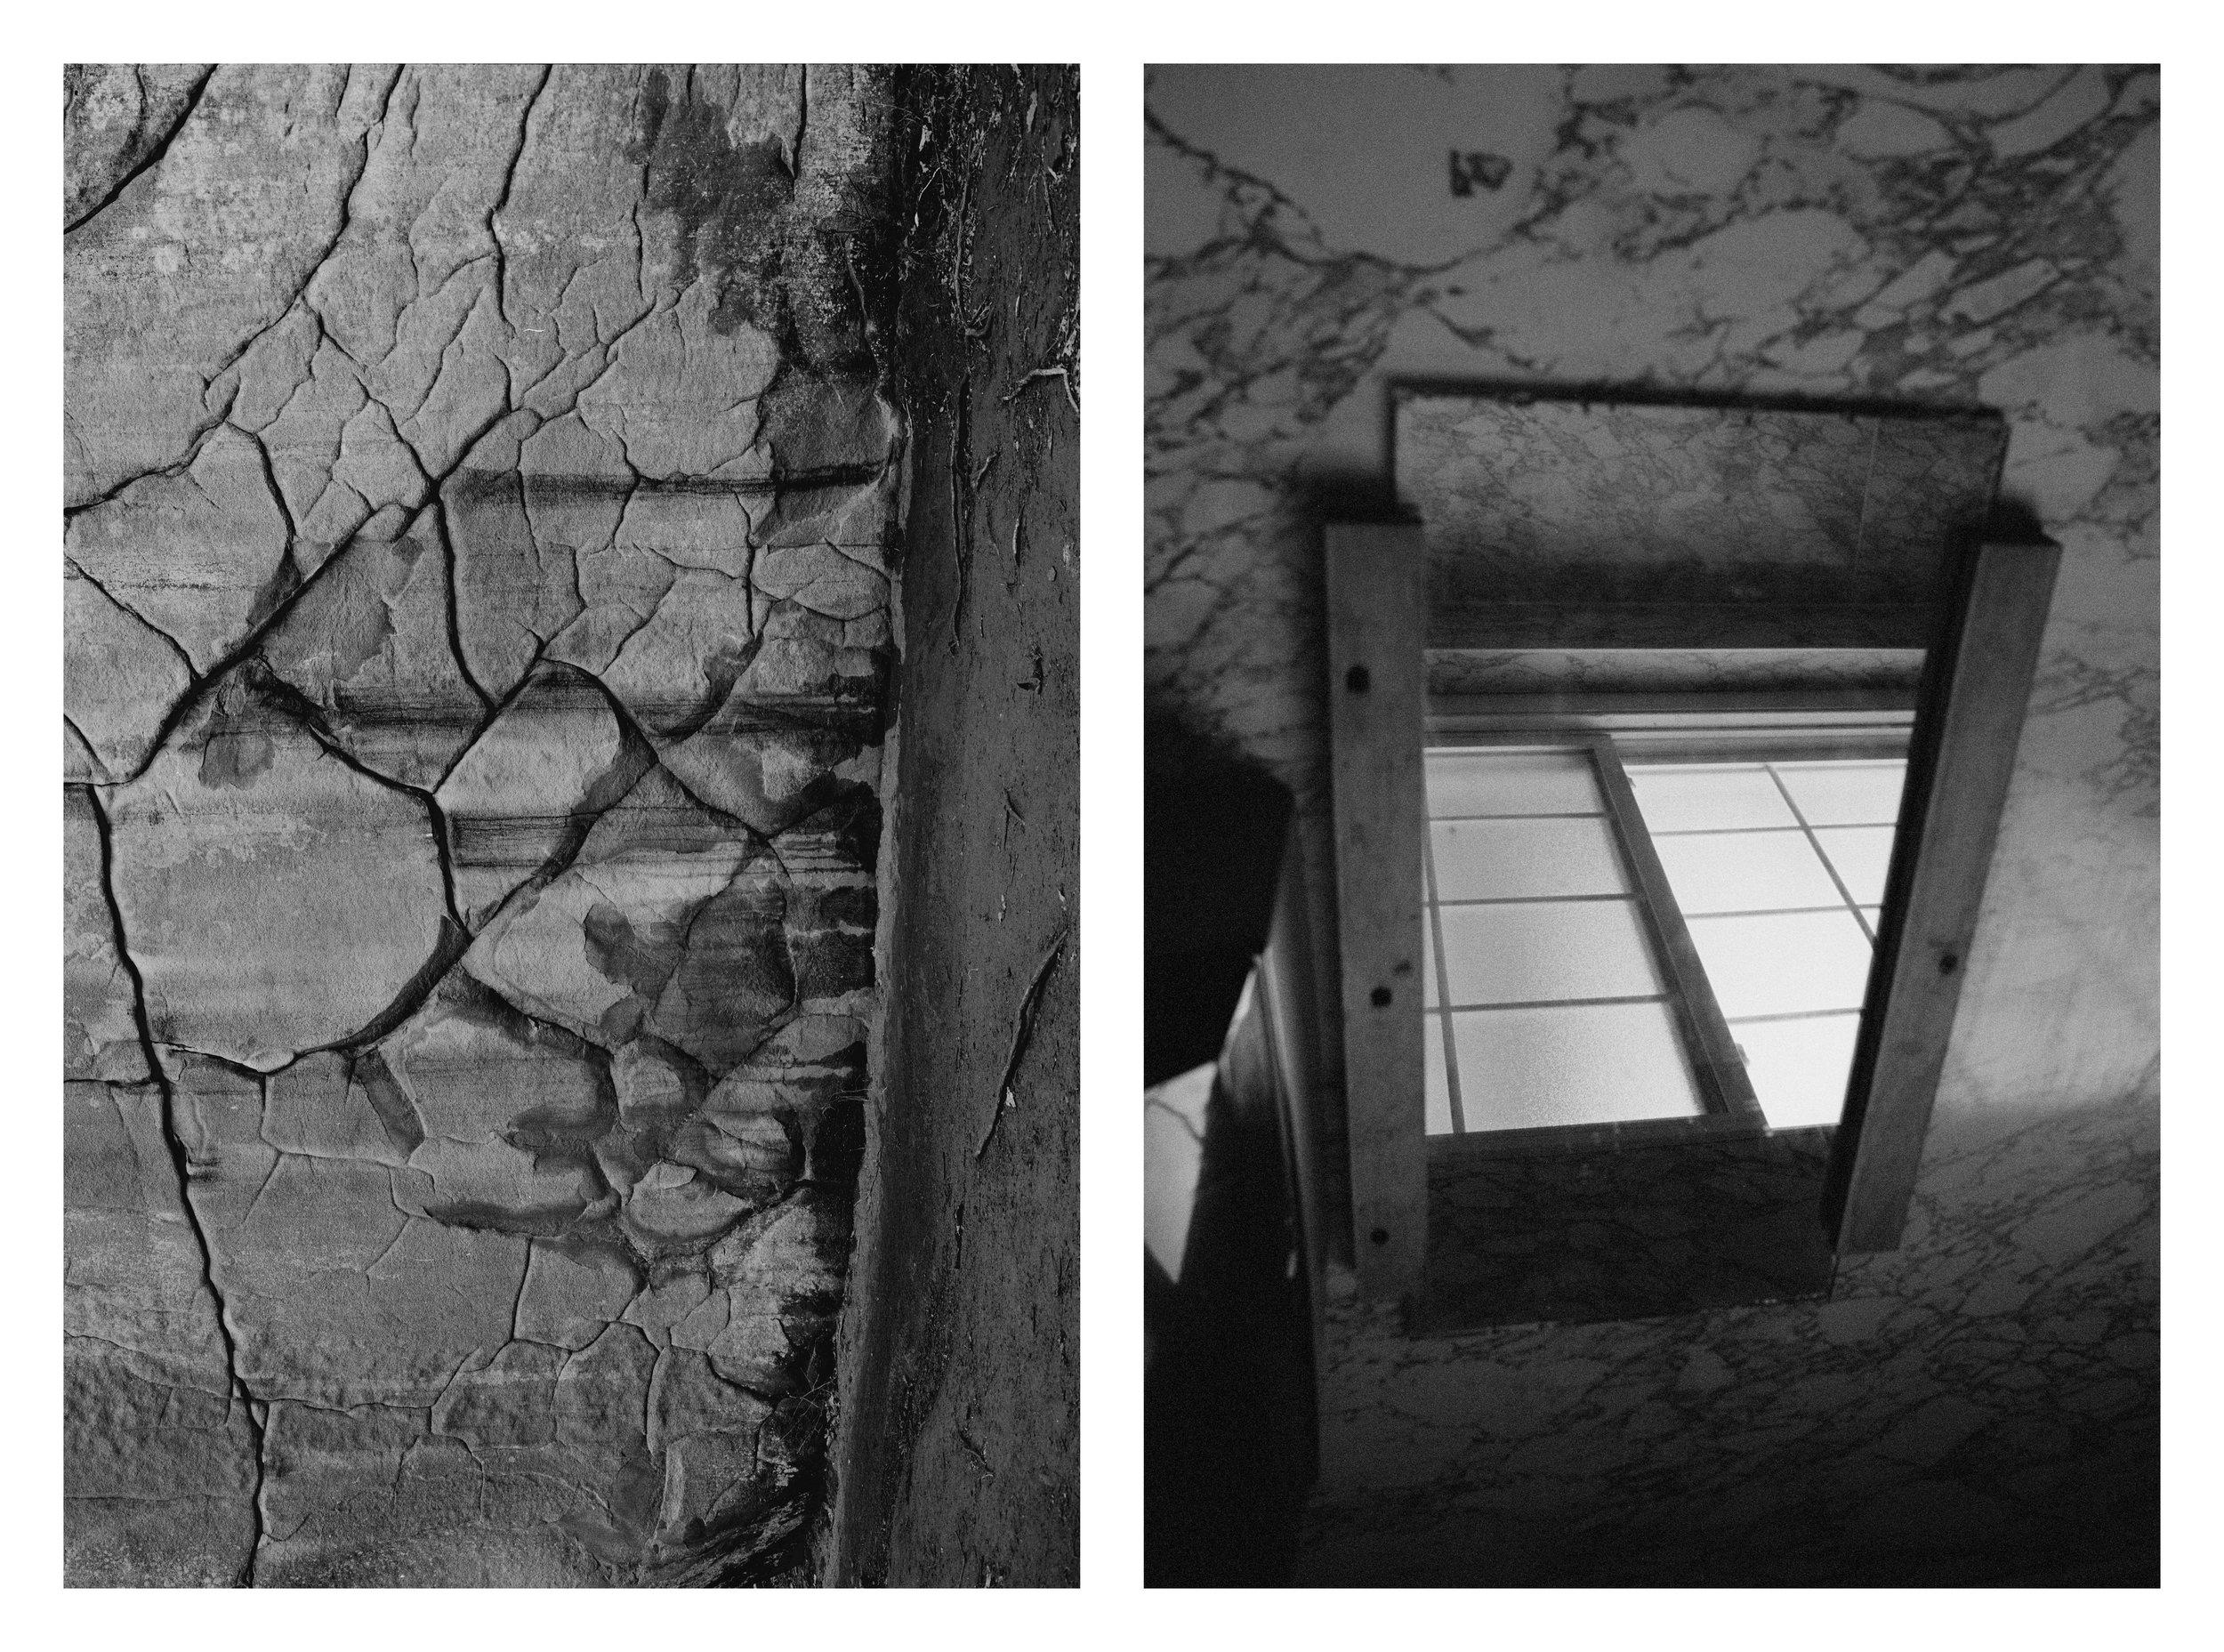 walls and window 2.jpg